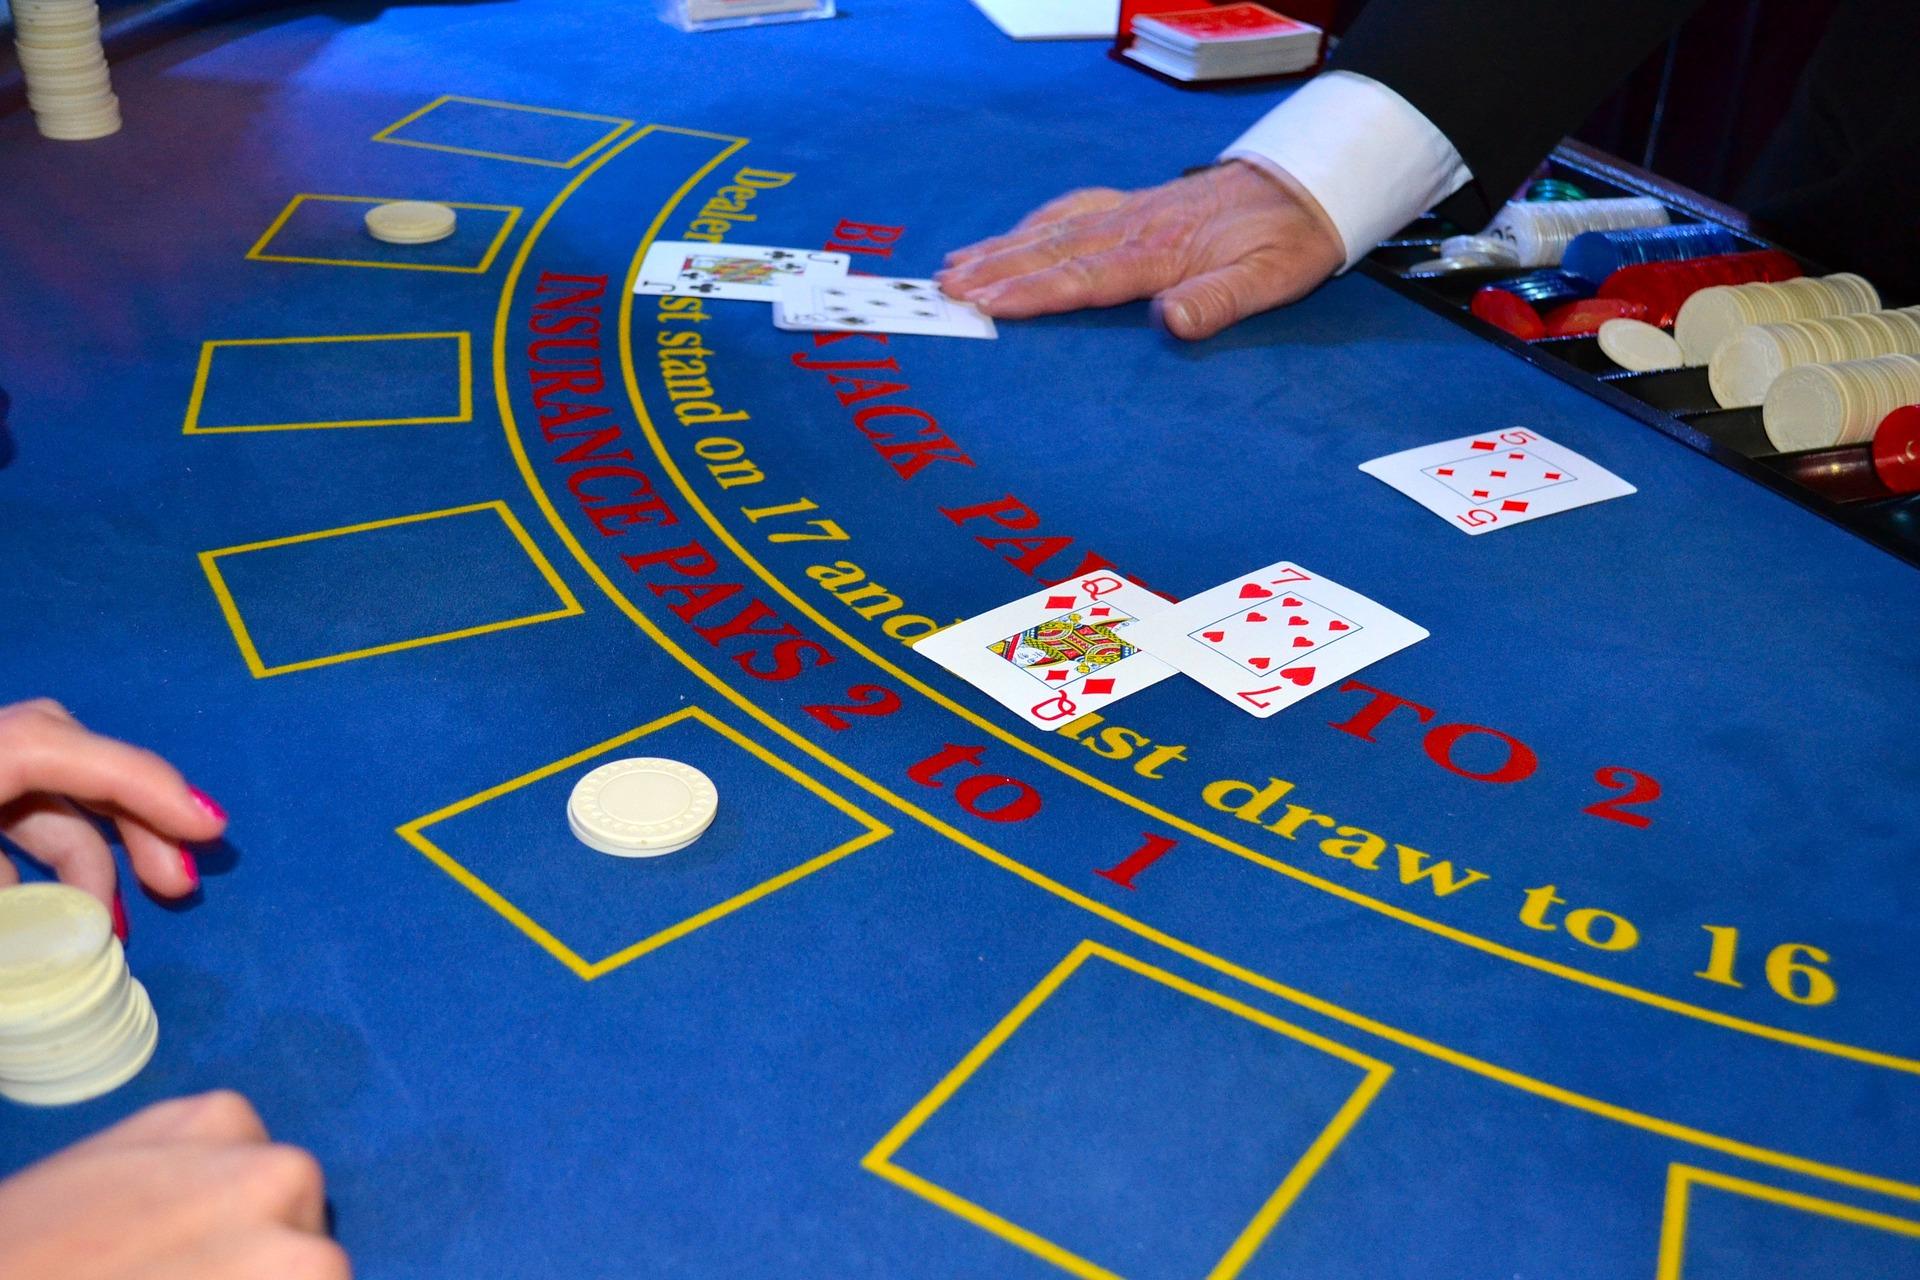 Bet casino